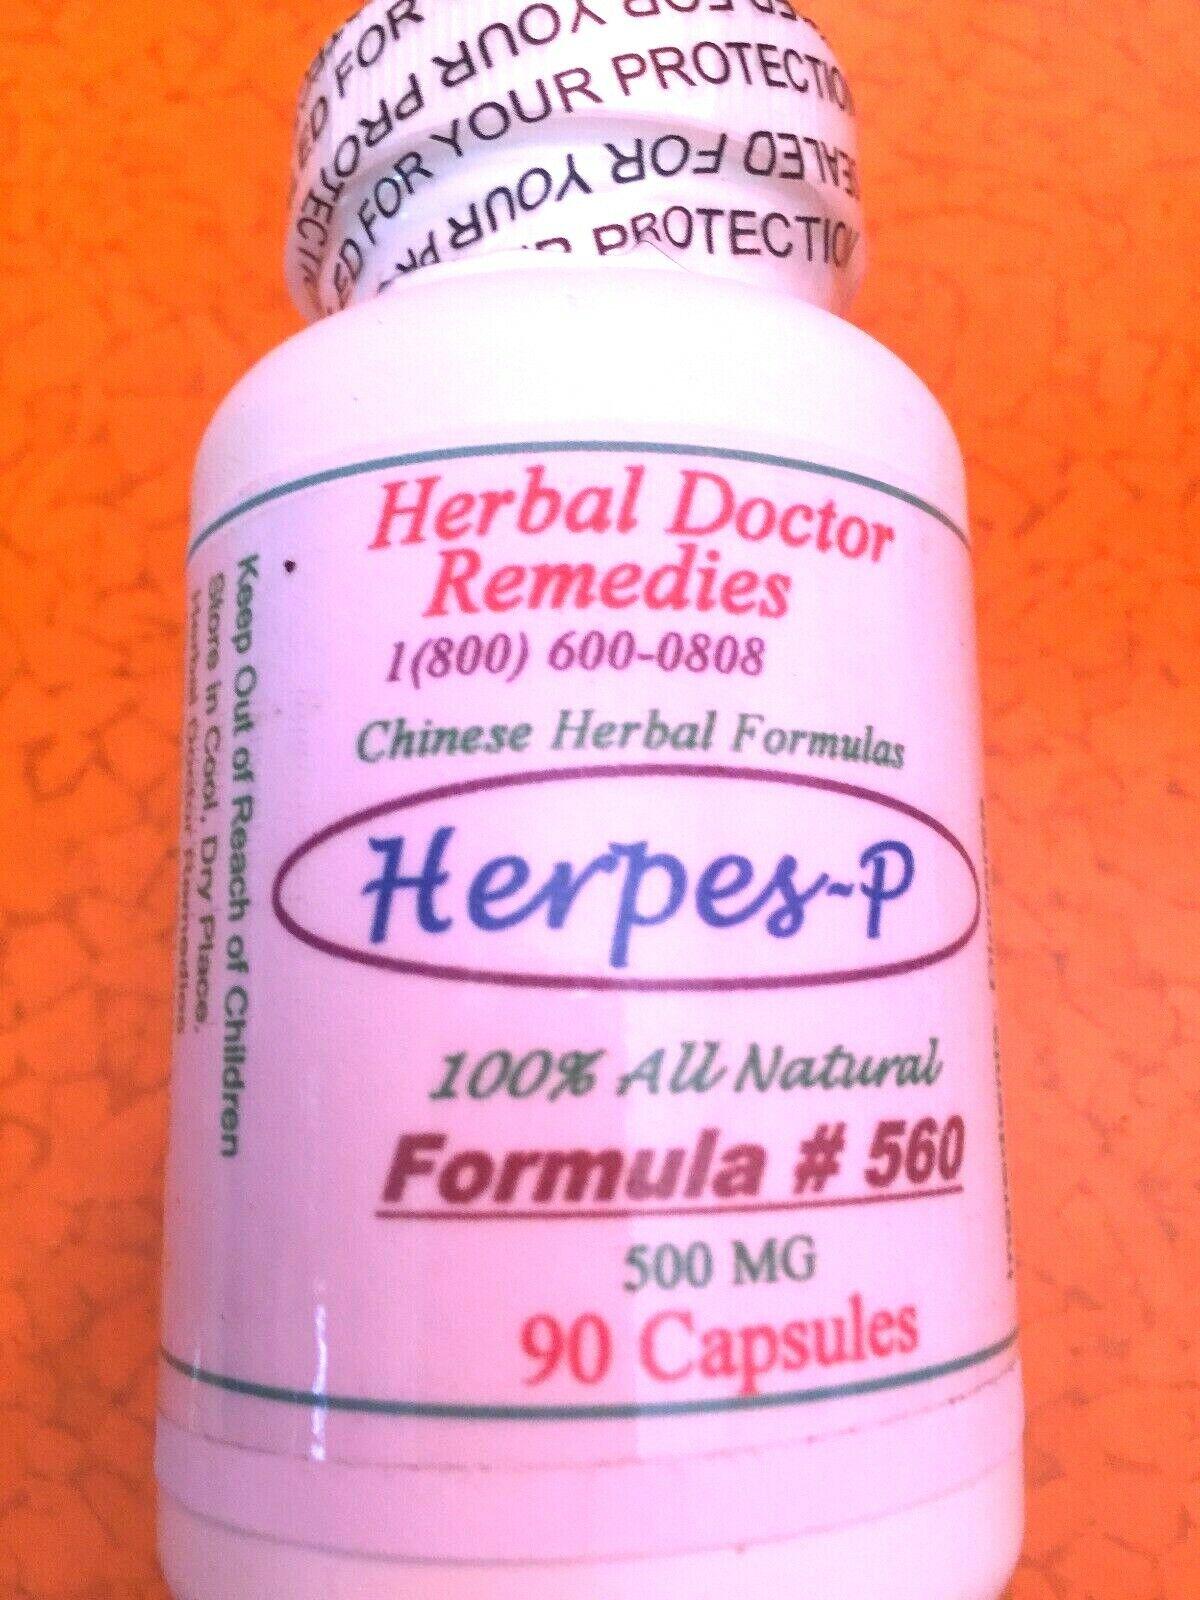 Herbdoc TCM Herpes P 90 Caps boosts immune  against virus  reduce internal heat